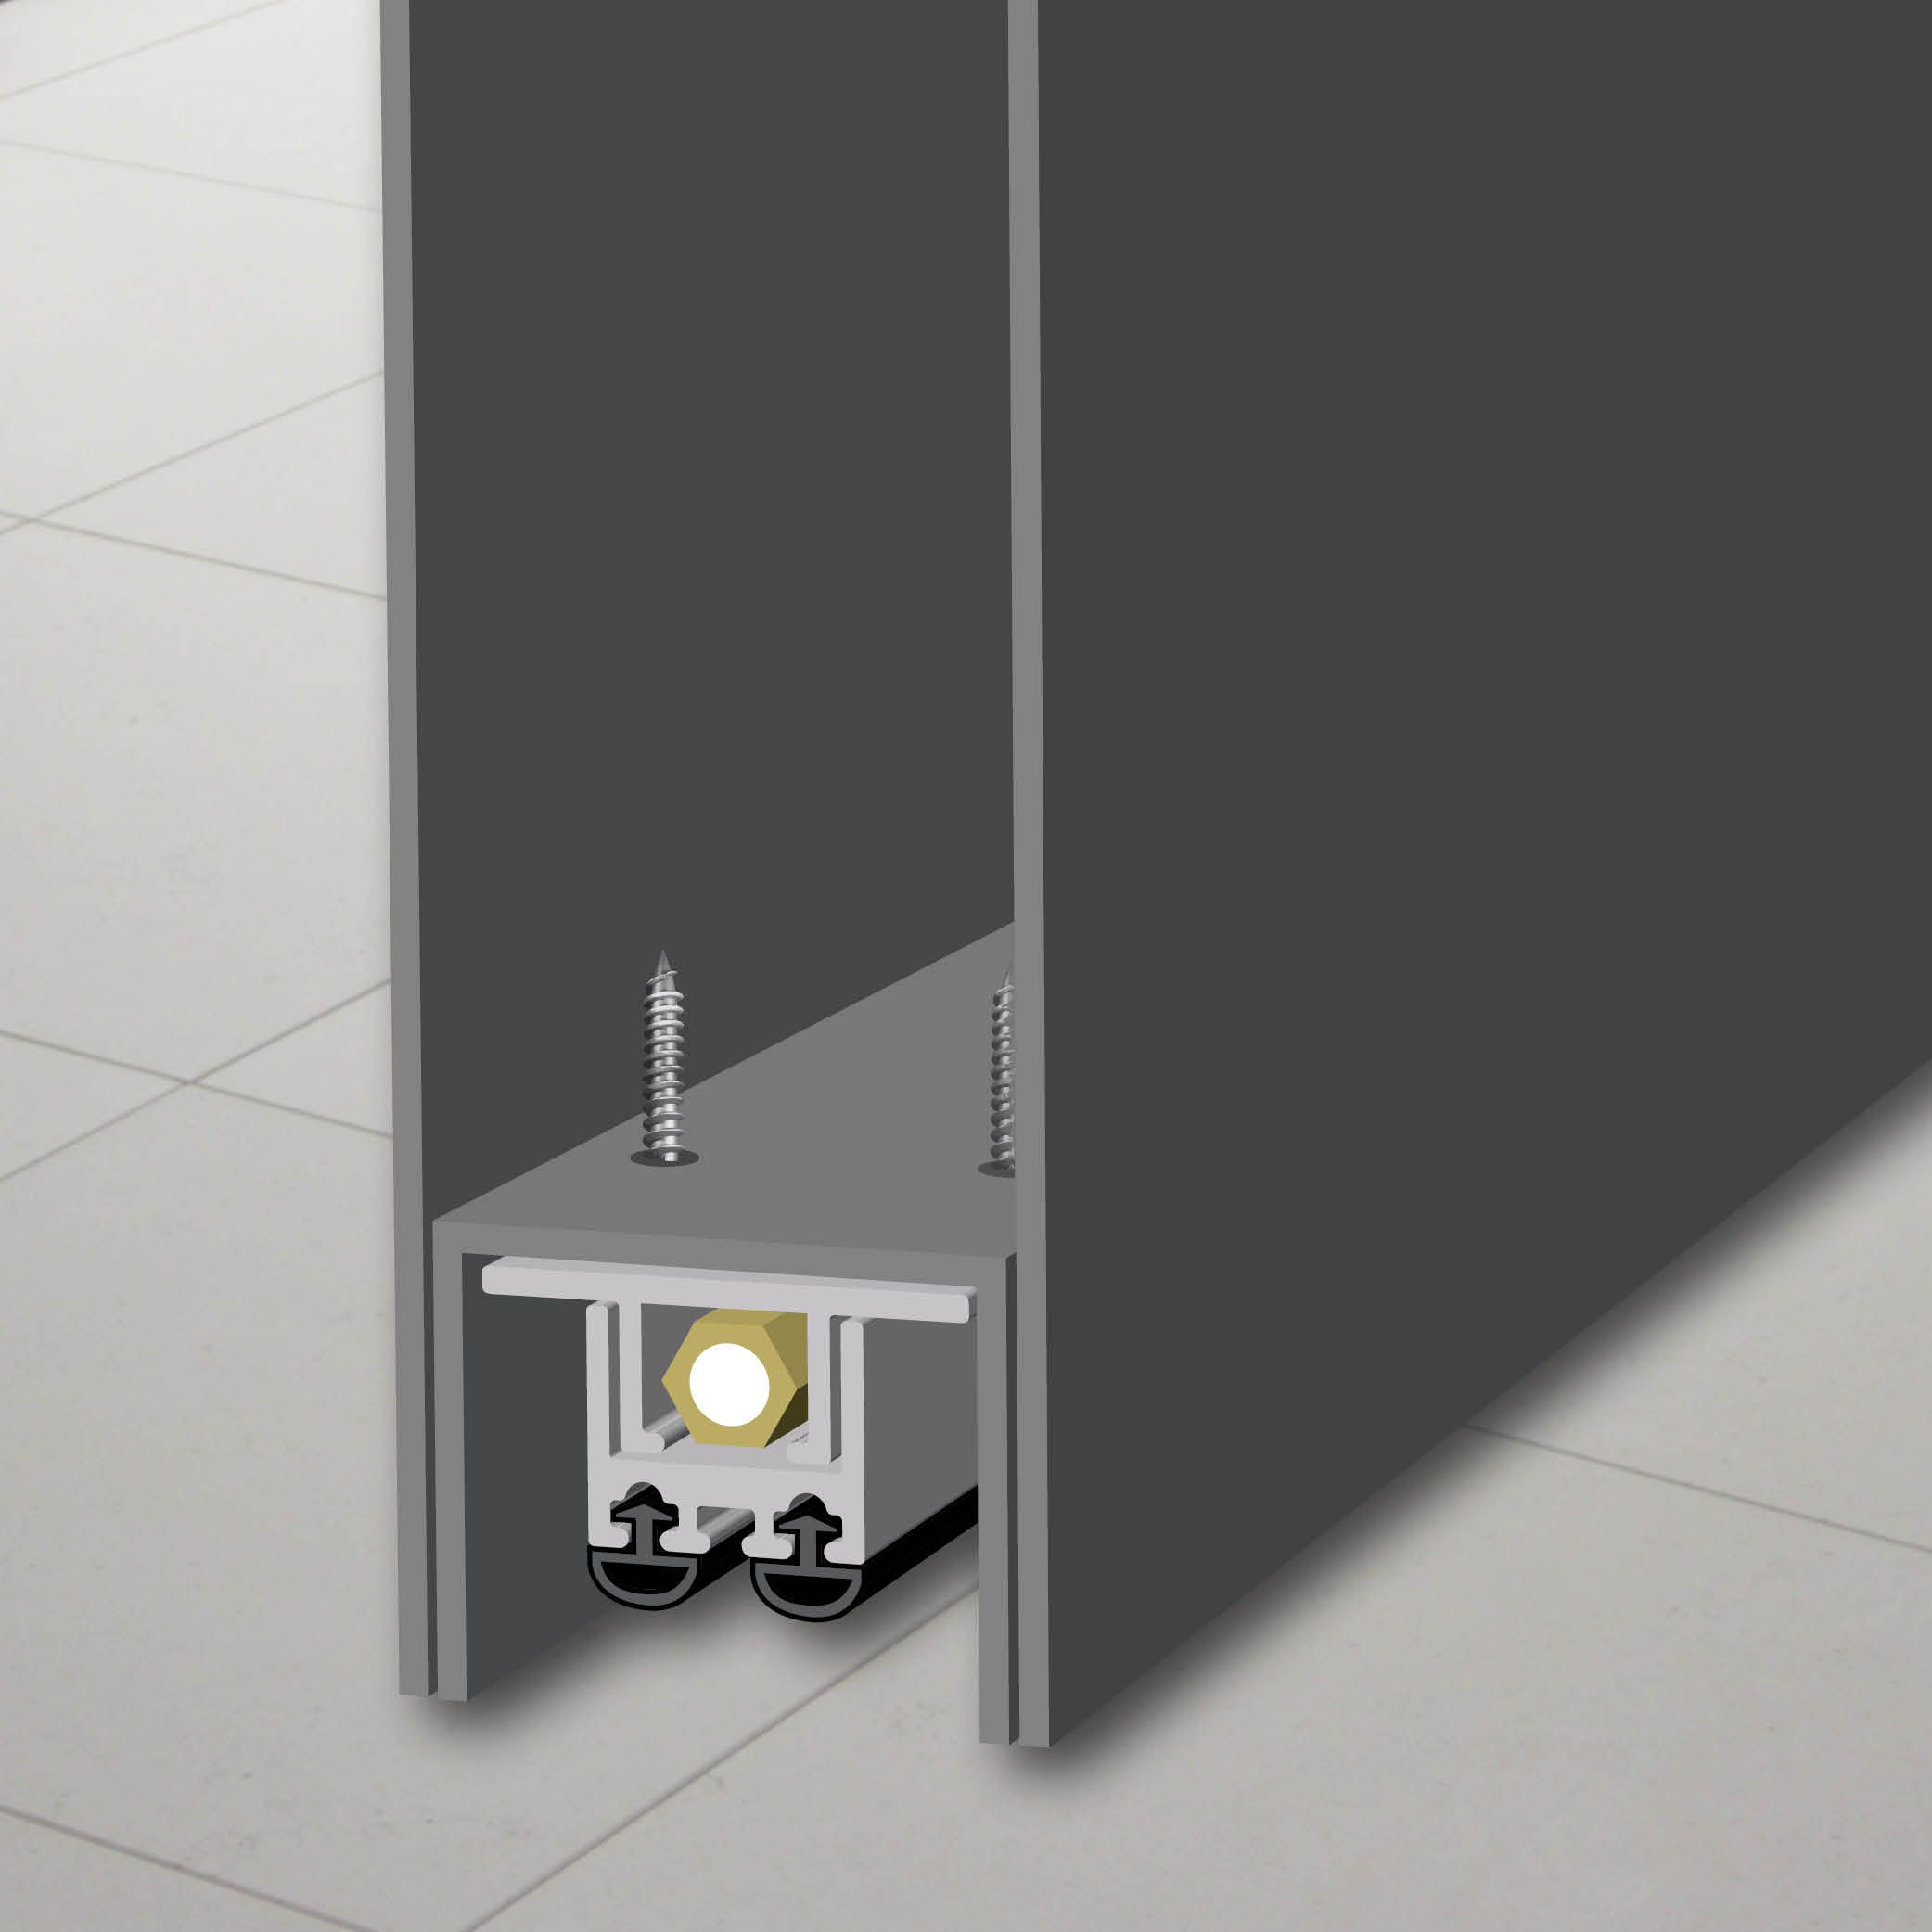 7553 Mortised Automatic Door Bottom Automatic Door Automatic Doors